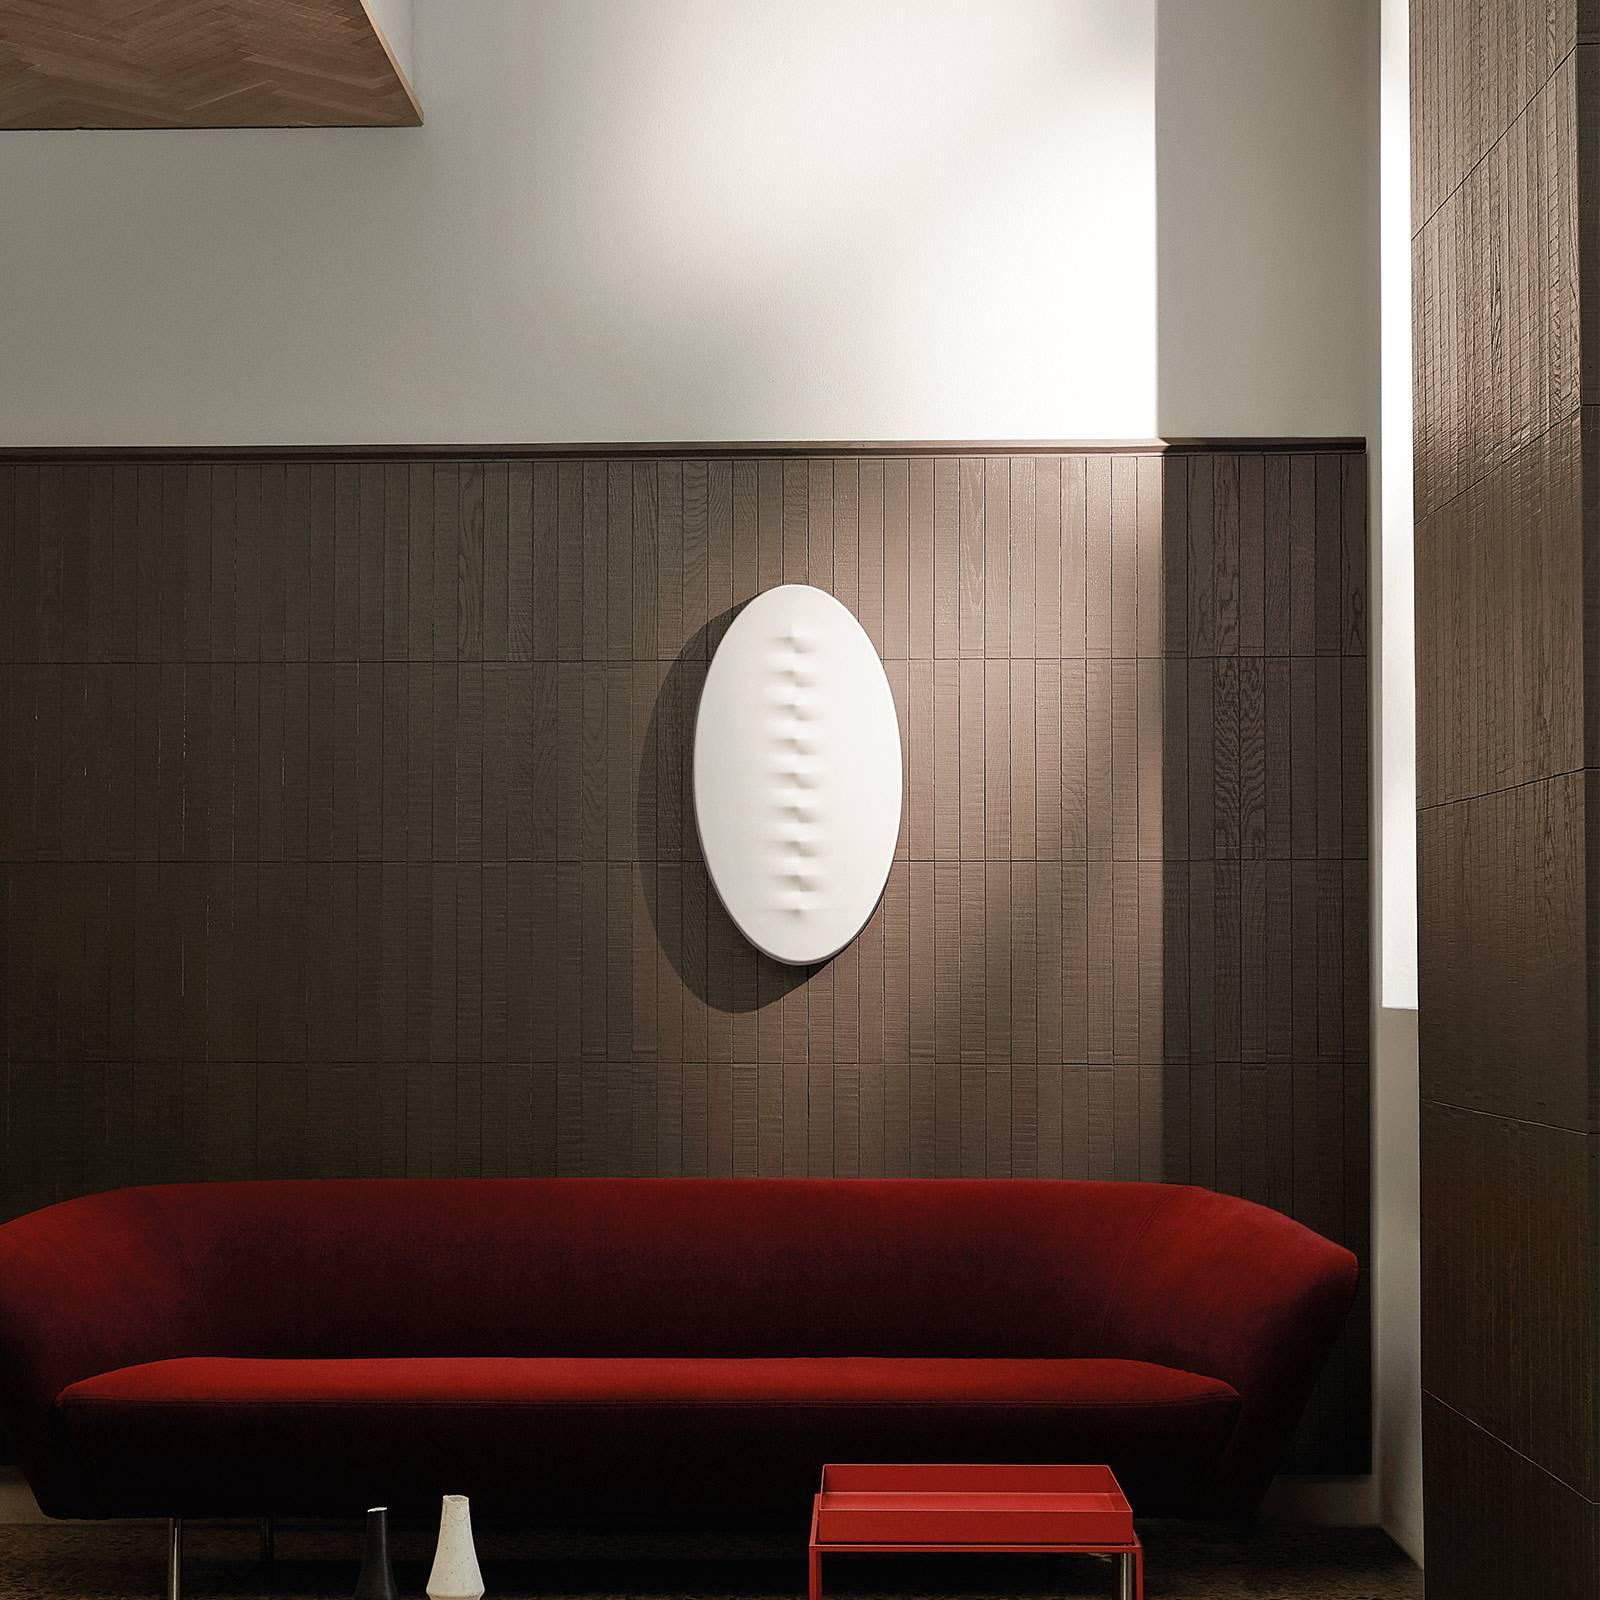 Foscarini Superficie media LED-Wandleuchte, 46 cm